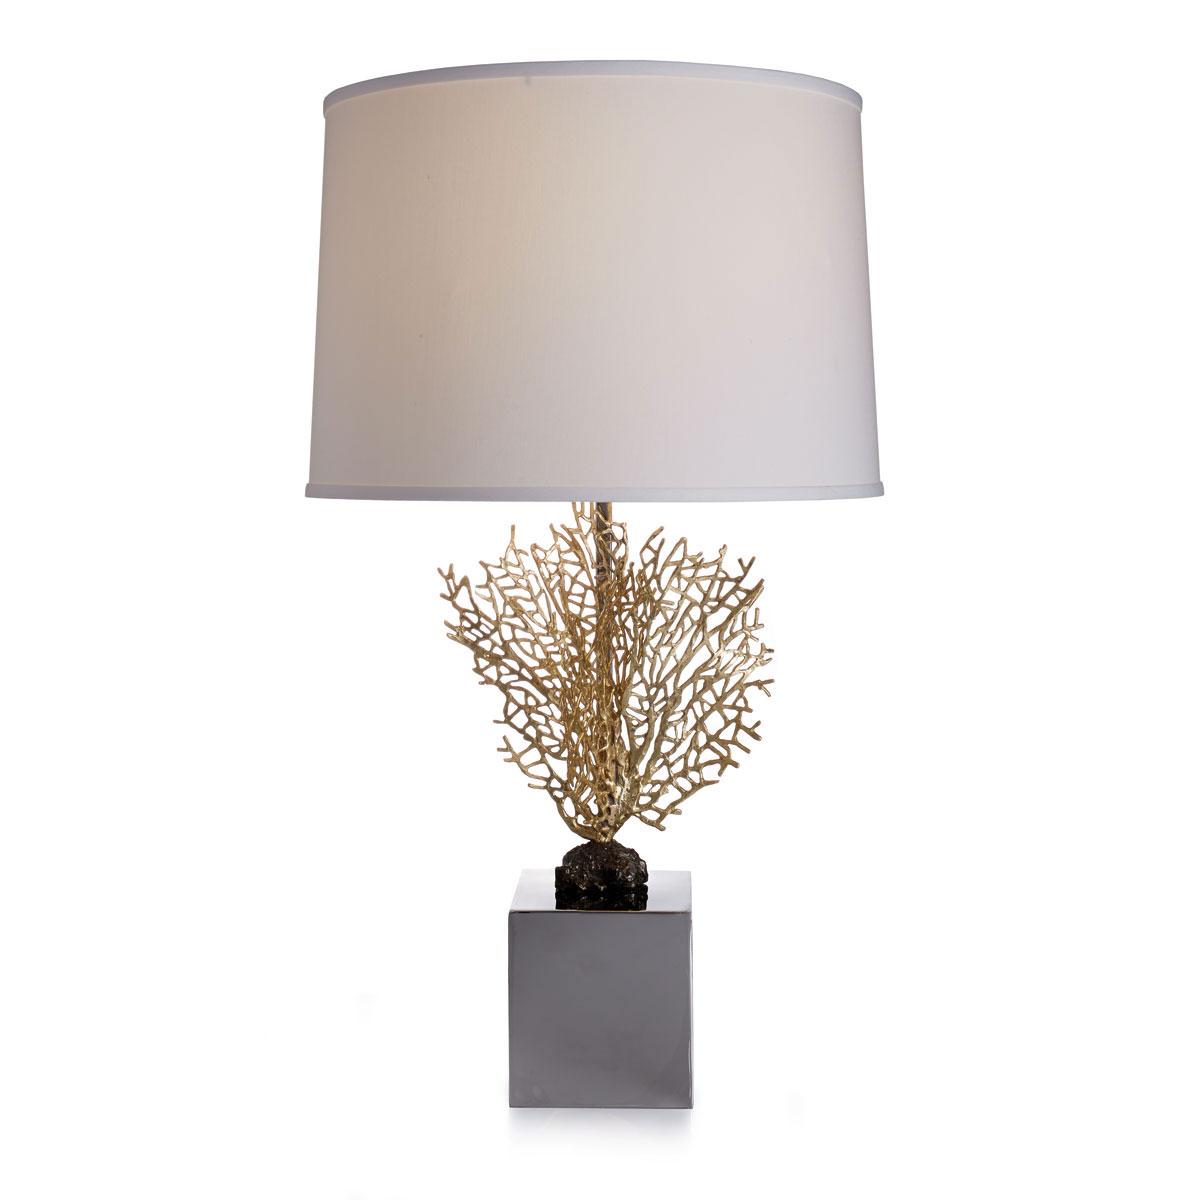 Michael Aram Fan Coral Table Lamp